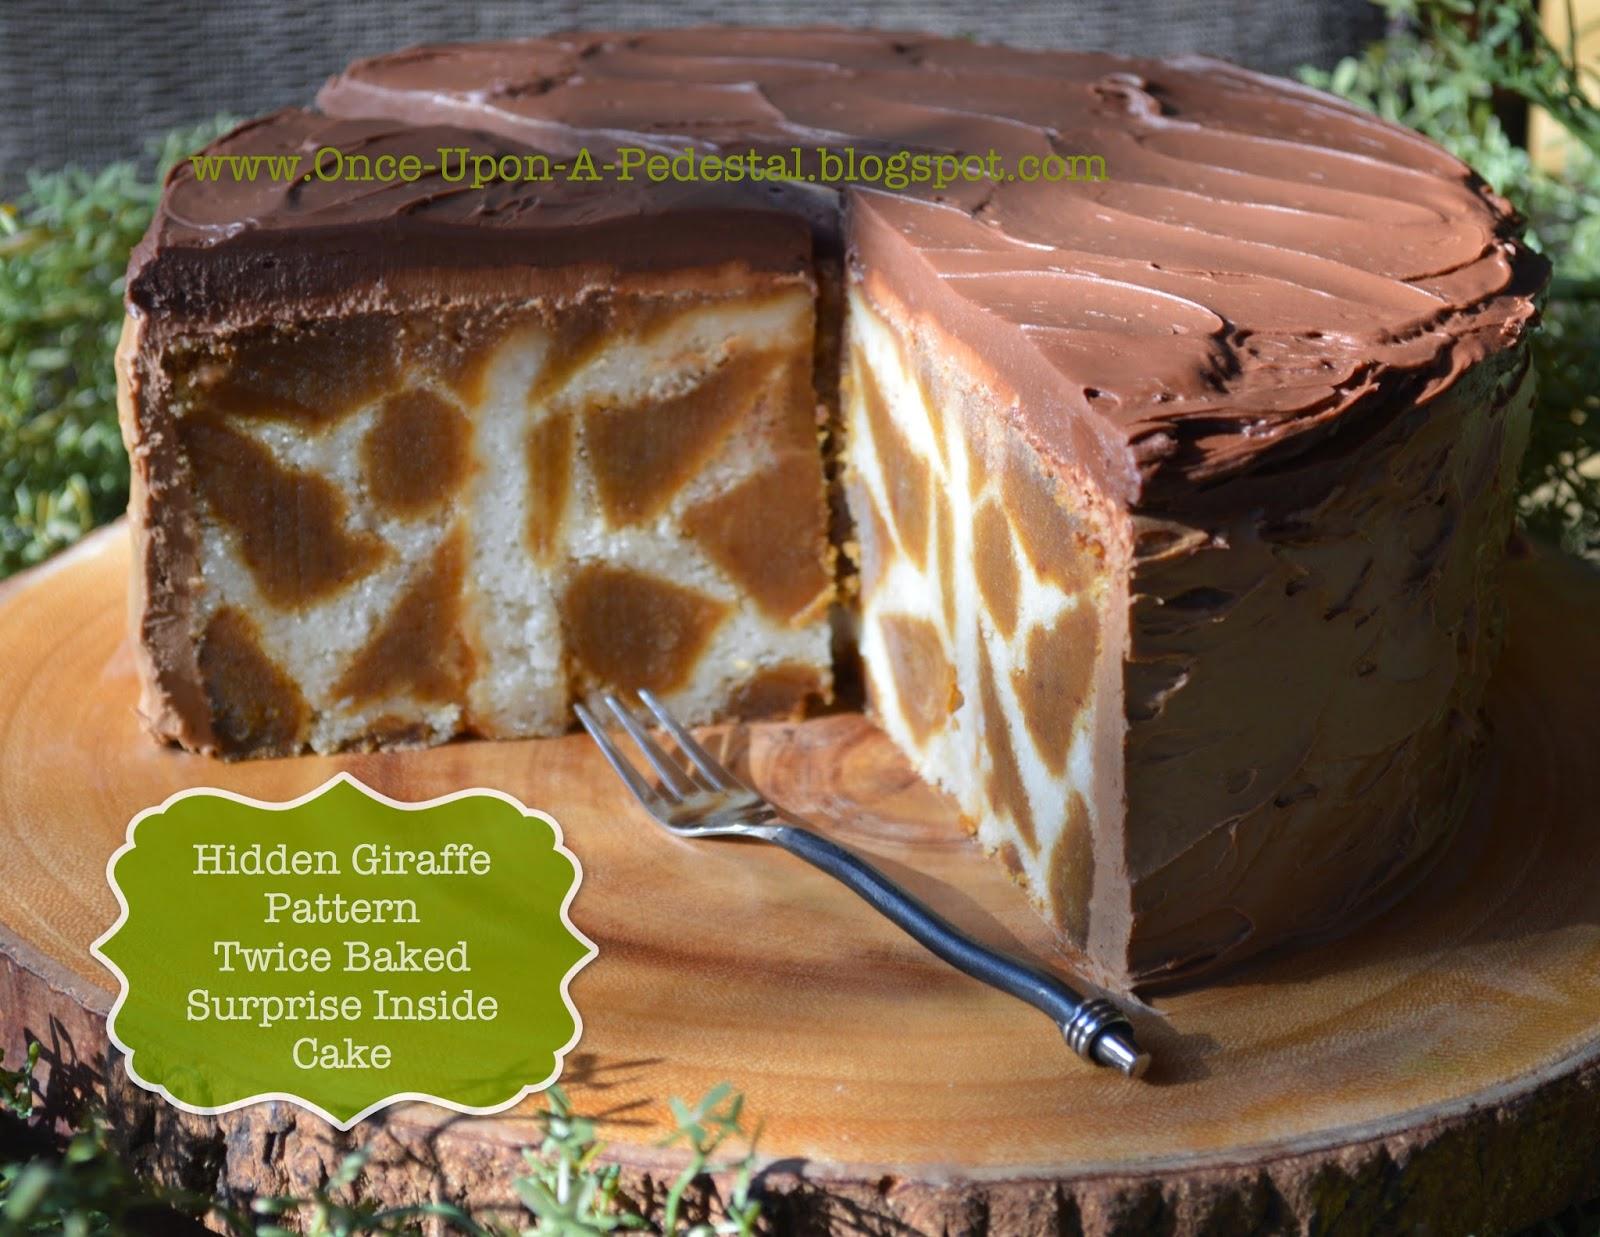 HDN Giraffe Ptrn w flourish link-001